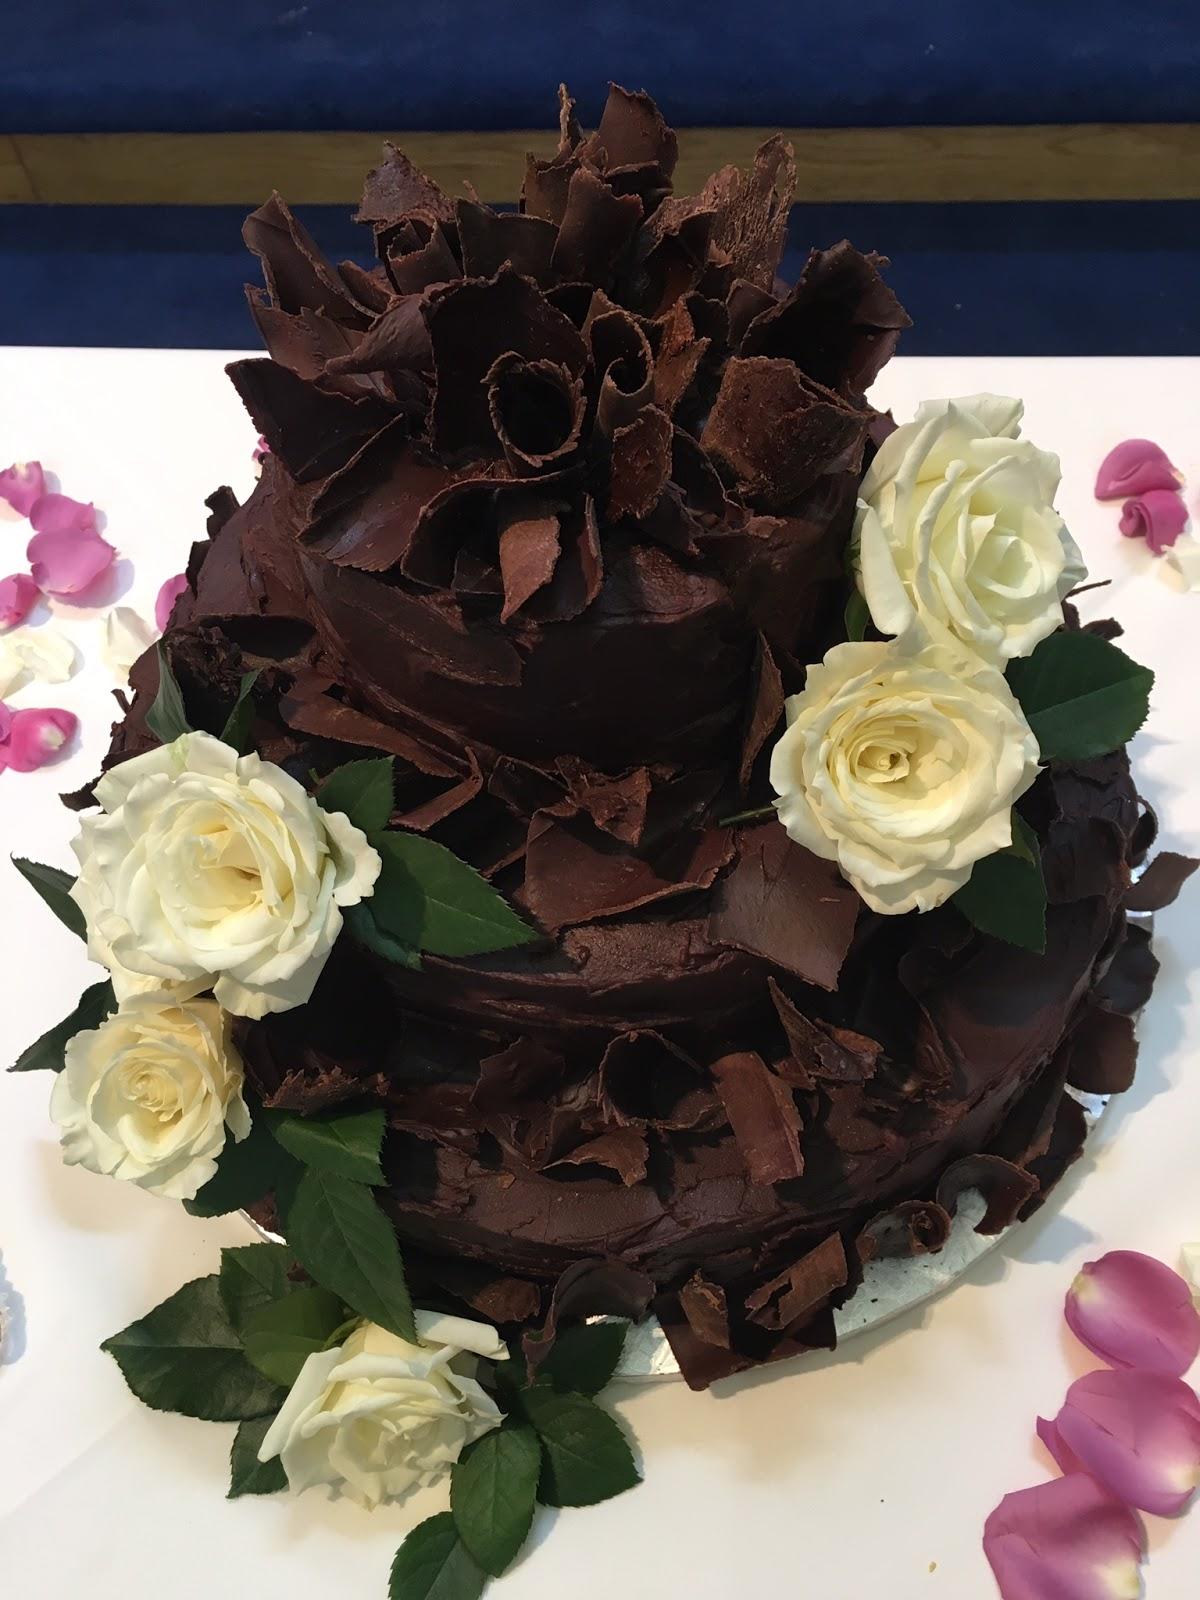 Wedding Cakes Northern Virginia Catering Northern VA DC And MD - Fudge Wedding Cake